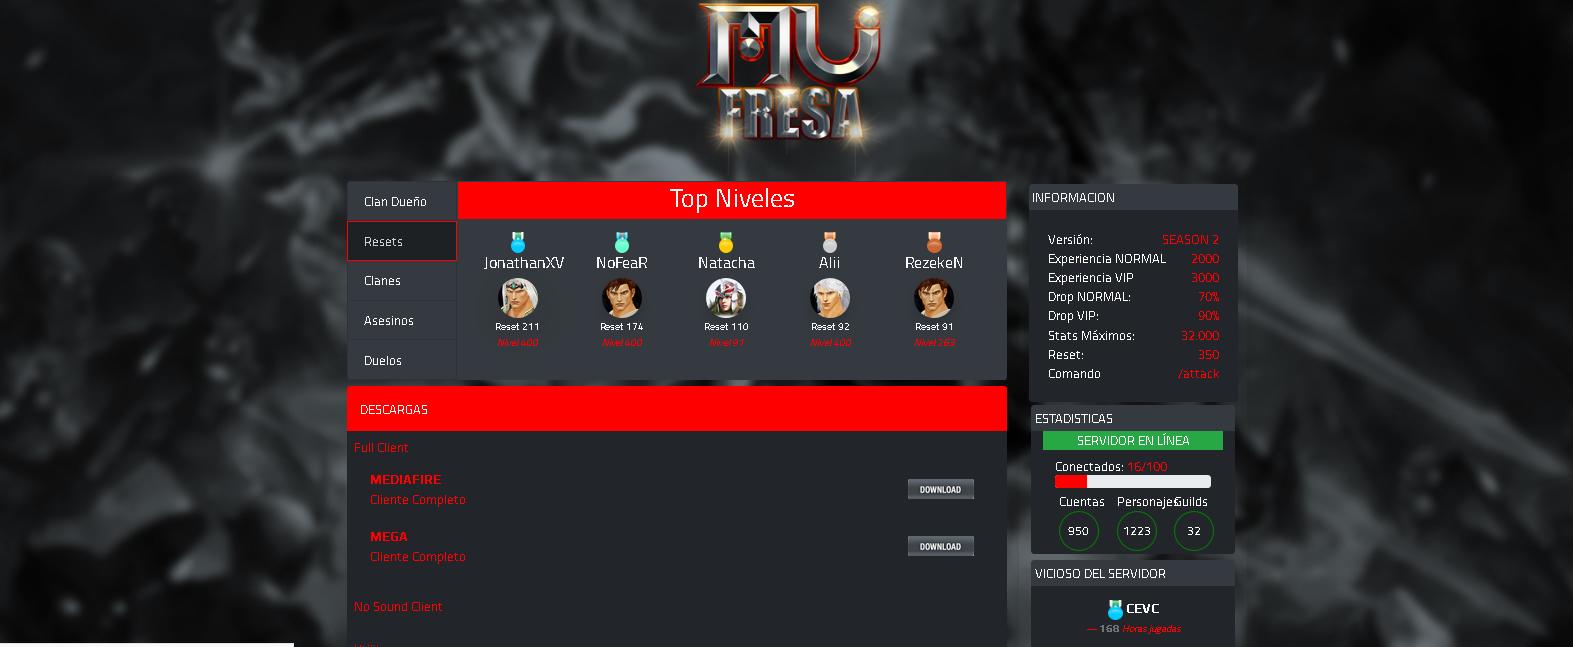 Template MuCow  para Mu Online Pirata - Plataforma MuCore 1.8 , mu site compativel com servidores Season 14 , como criar servidor de mu online pirata season 14 .